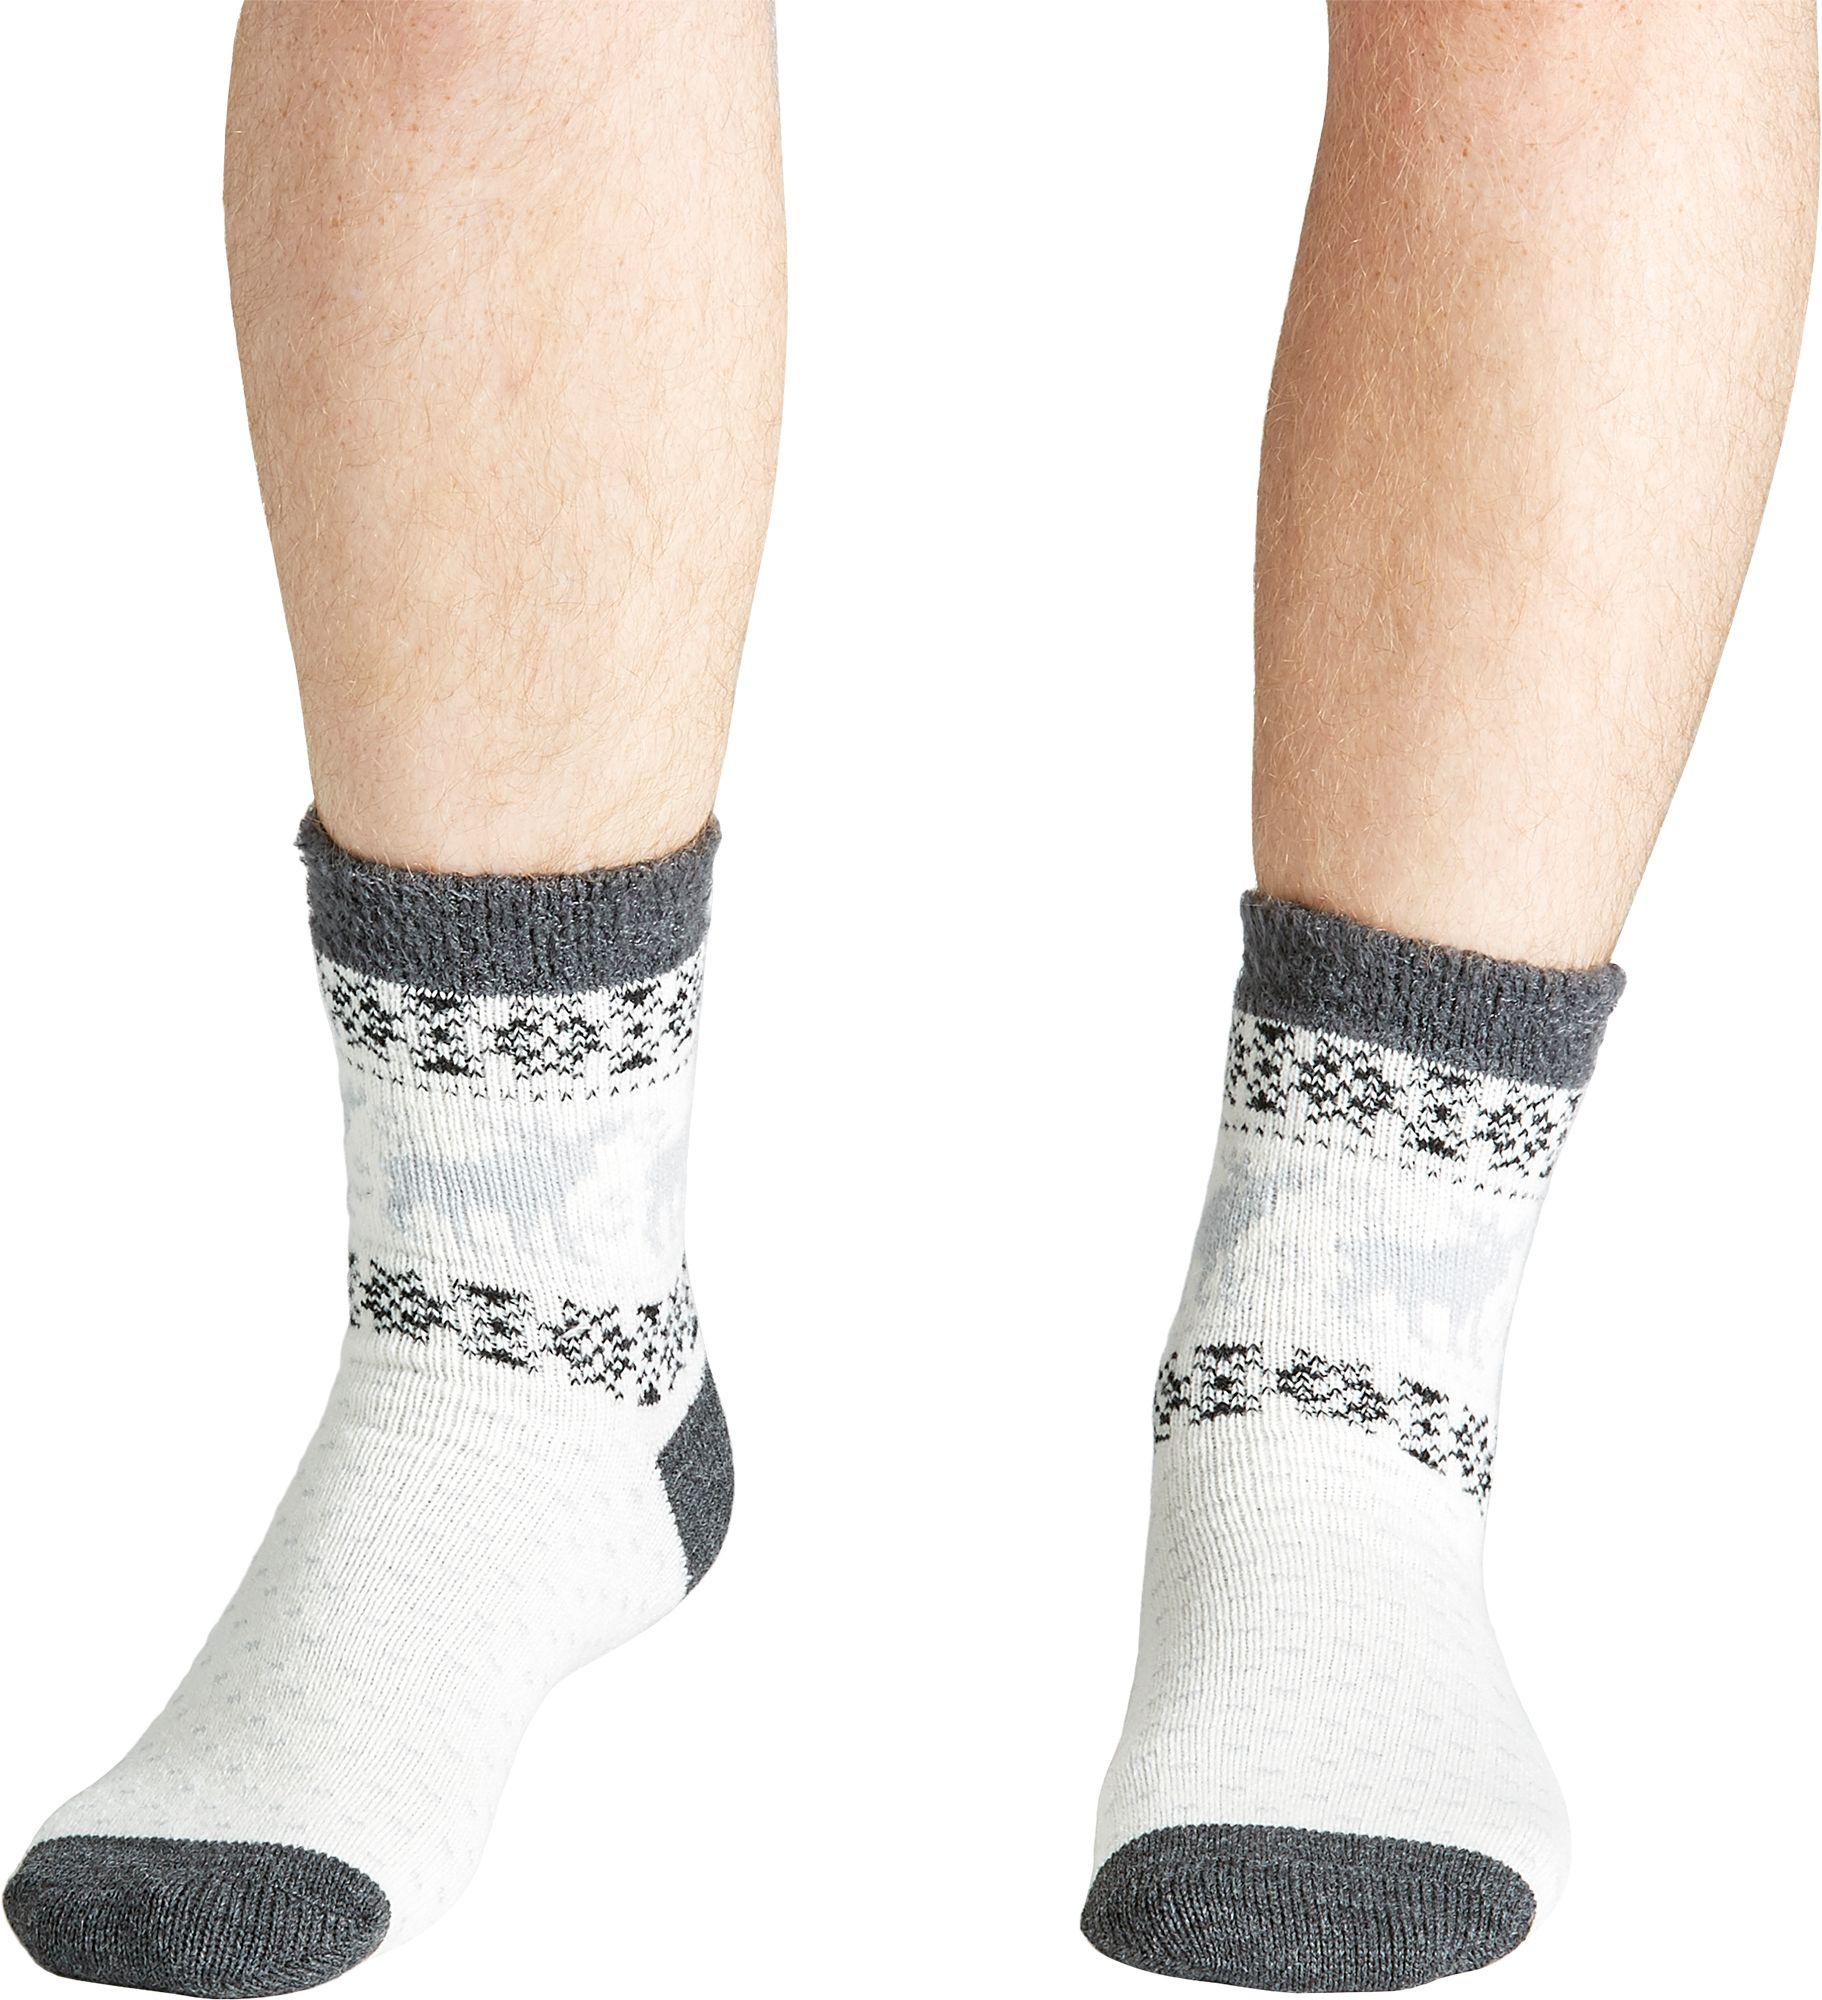 Field & Stream Men's Cozy Cabin Moose Block Socks, Size: 10-13, Dark Grey